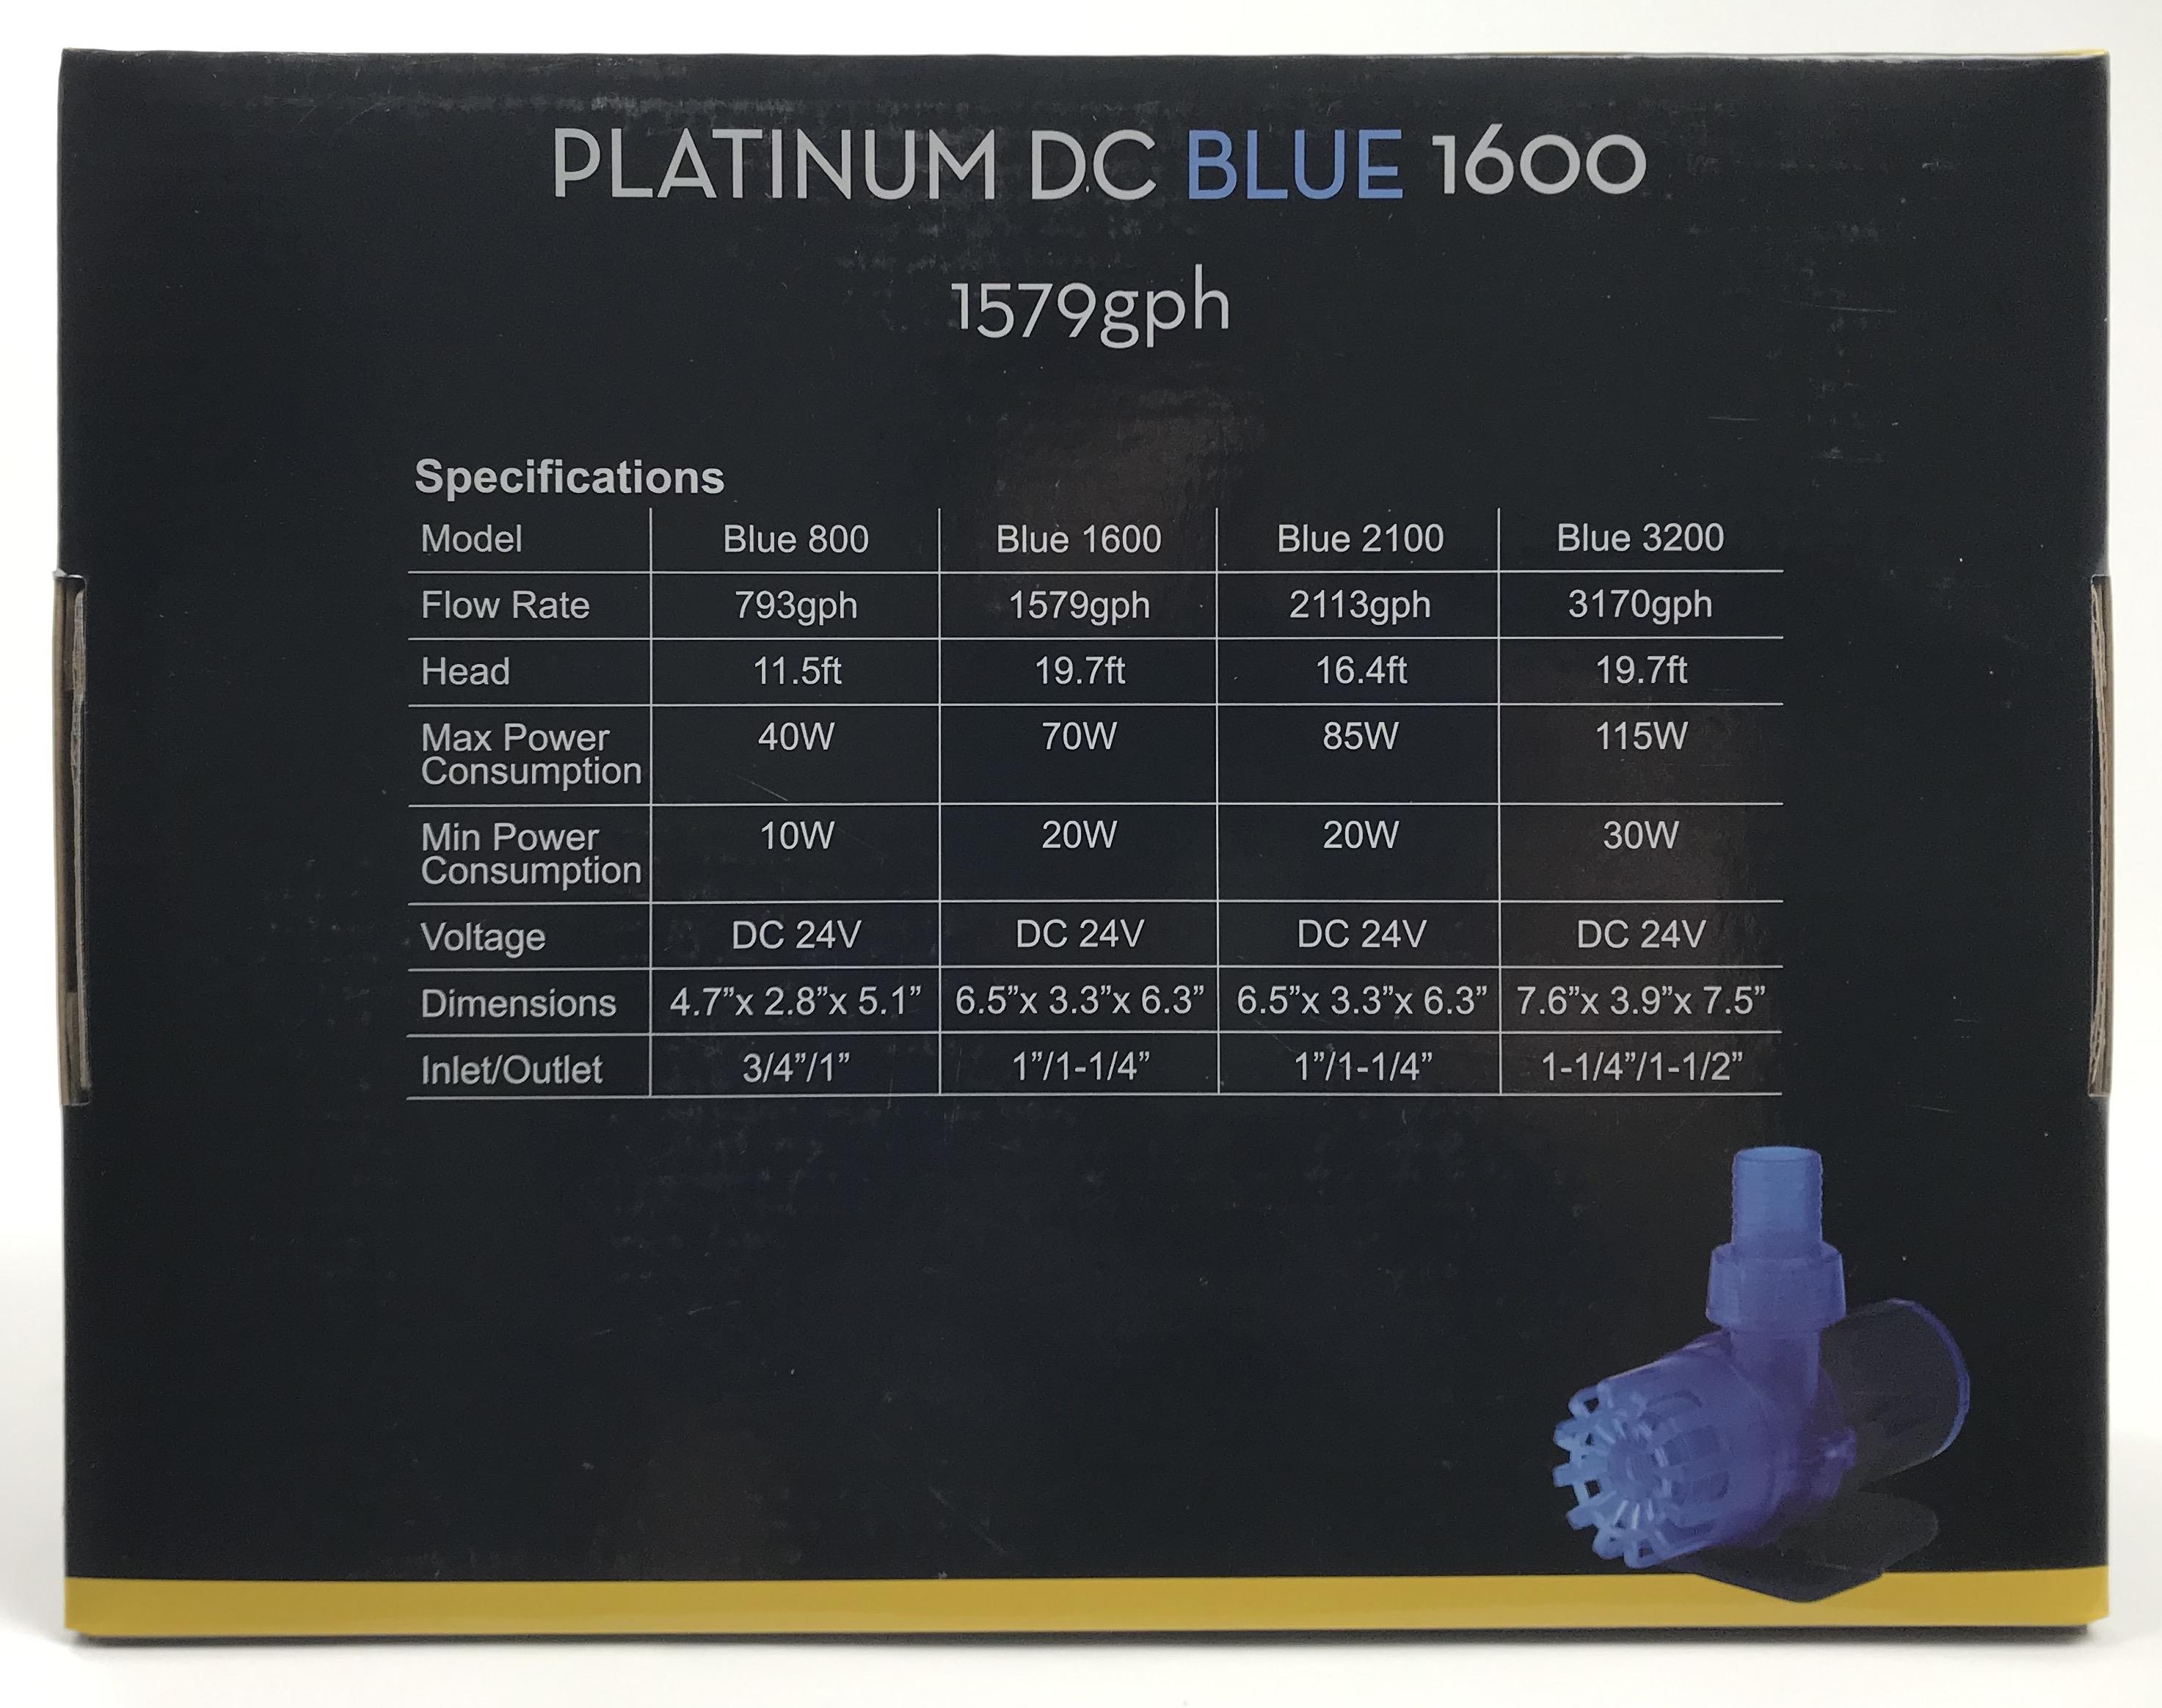 Platinum DC Blue 1600 Pump - 1579 gph